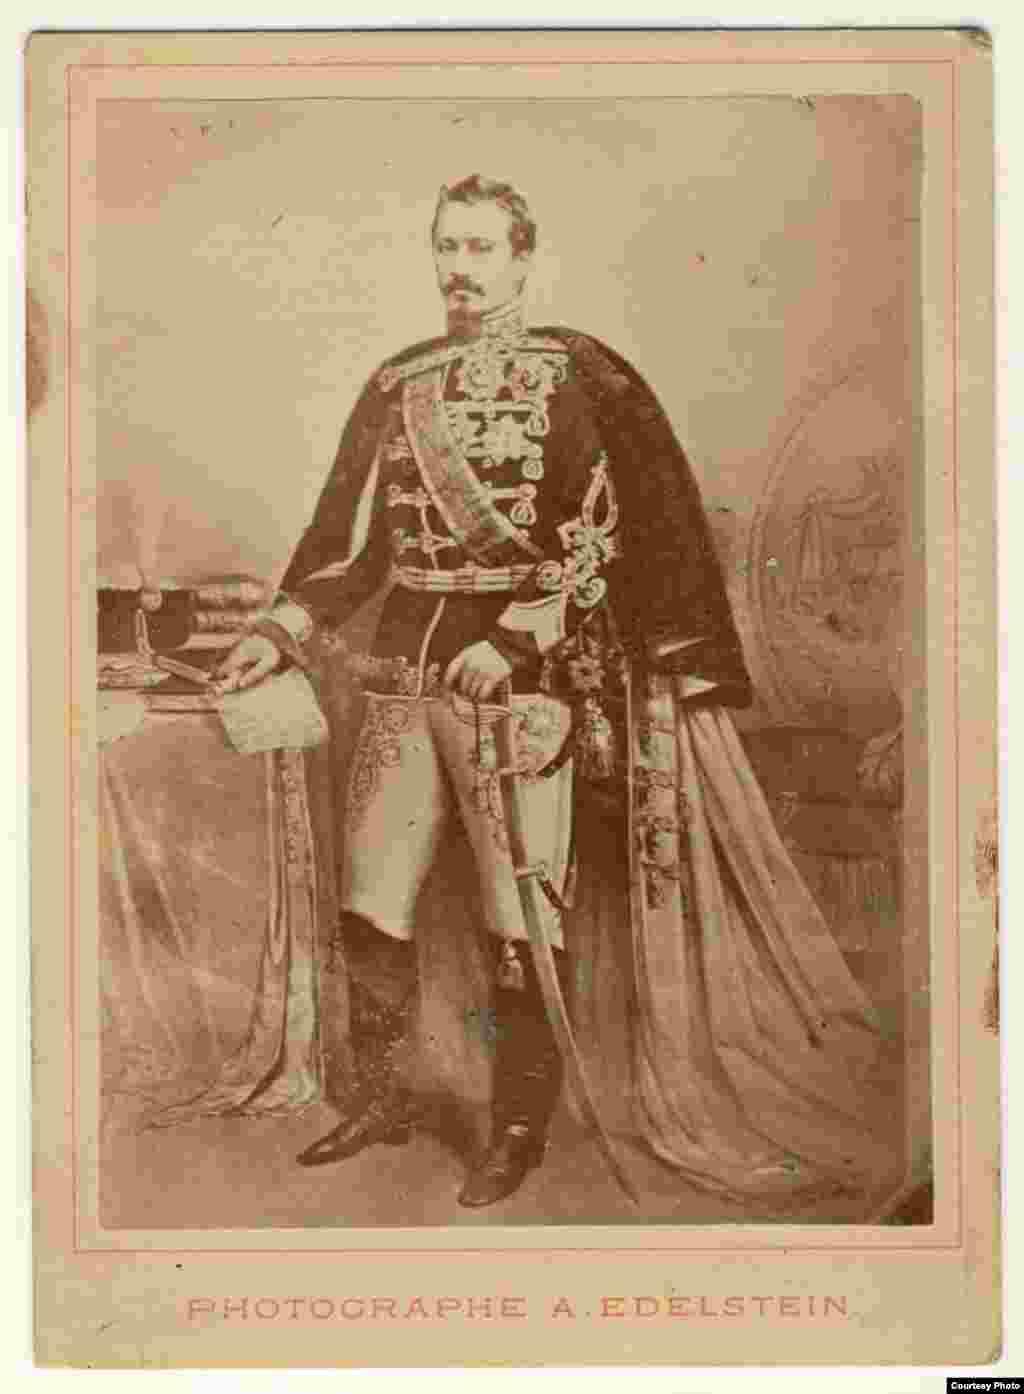 Alexandru Ioan Cuza, domnitorul Principatelor Unite